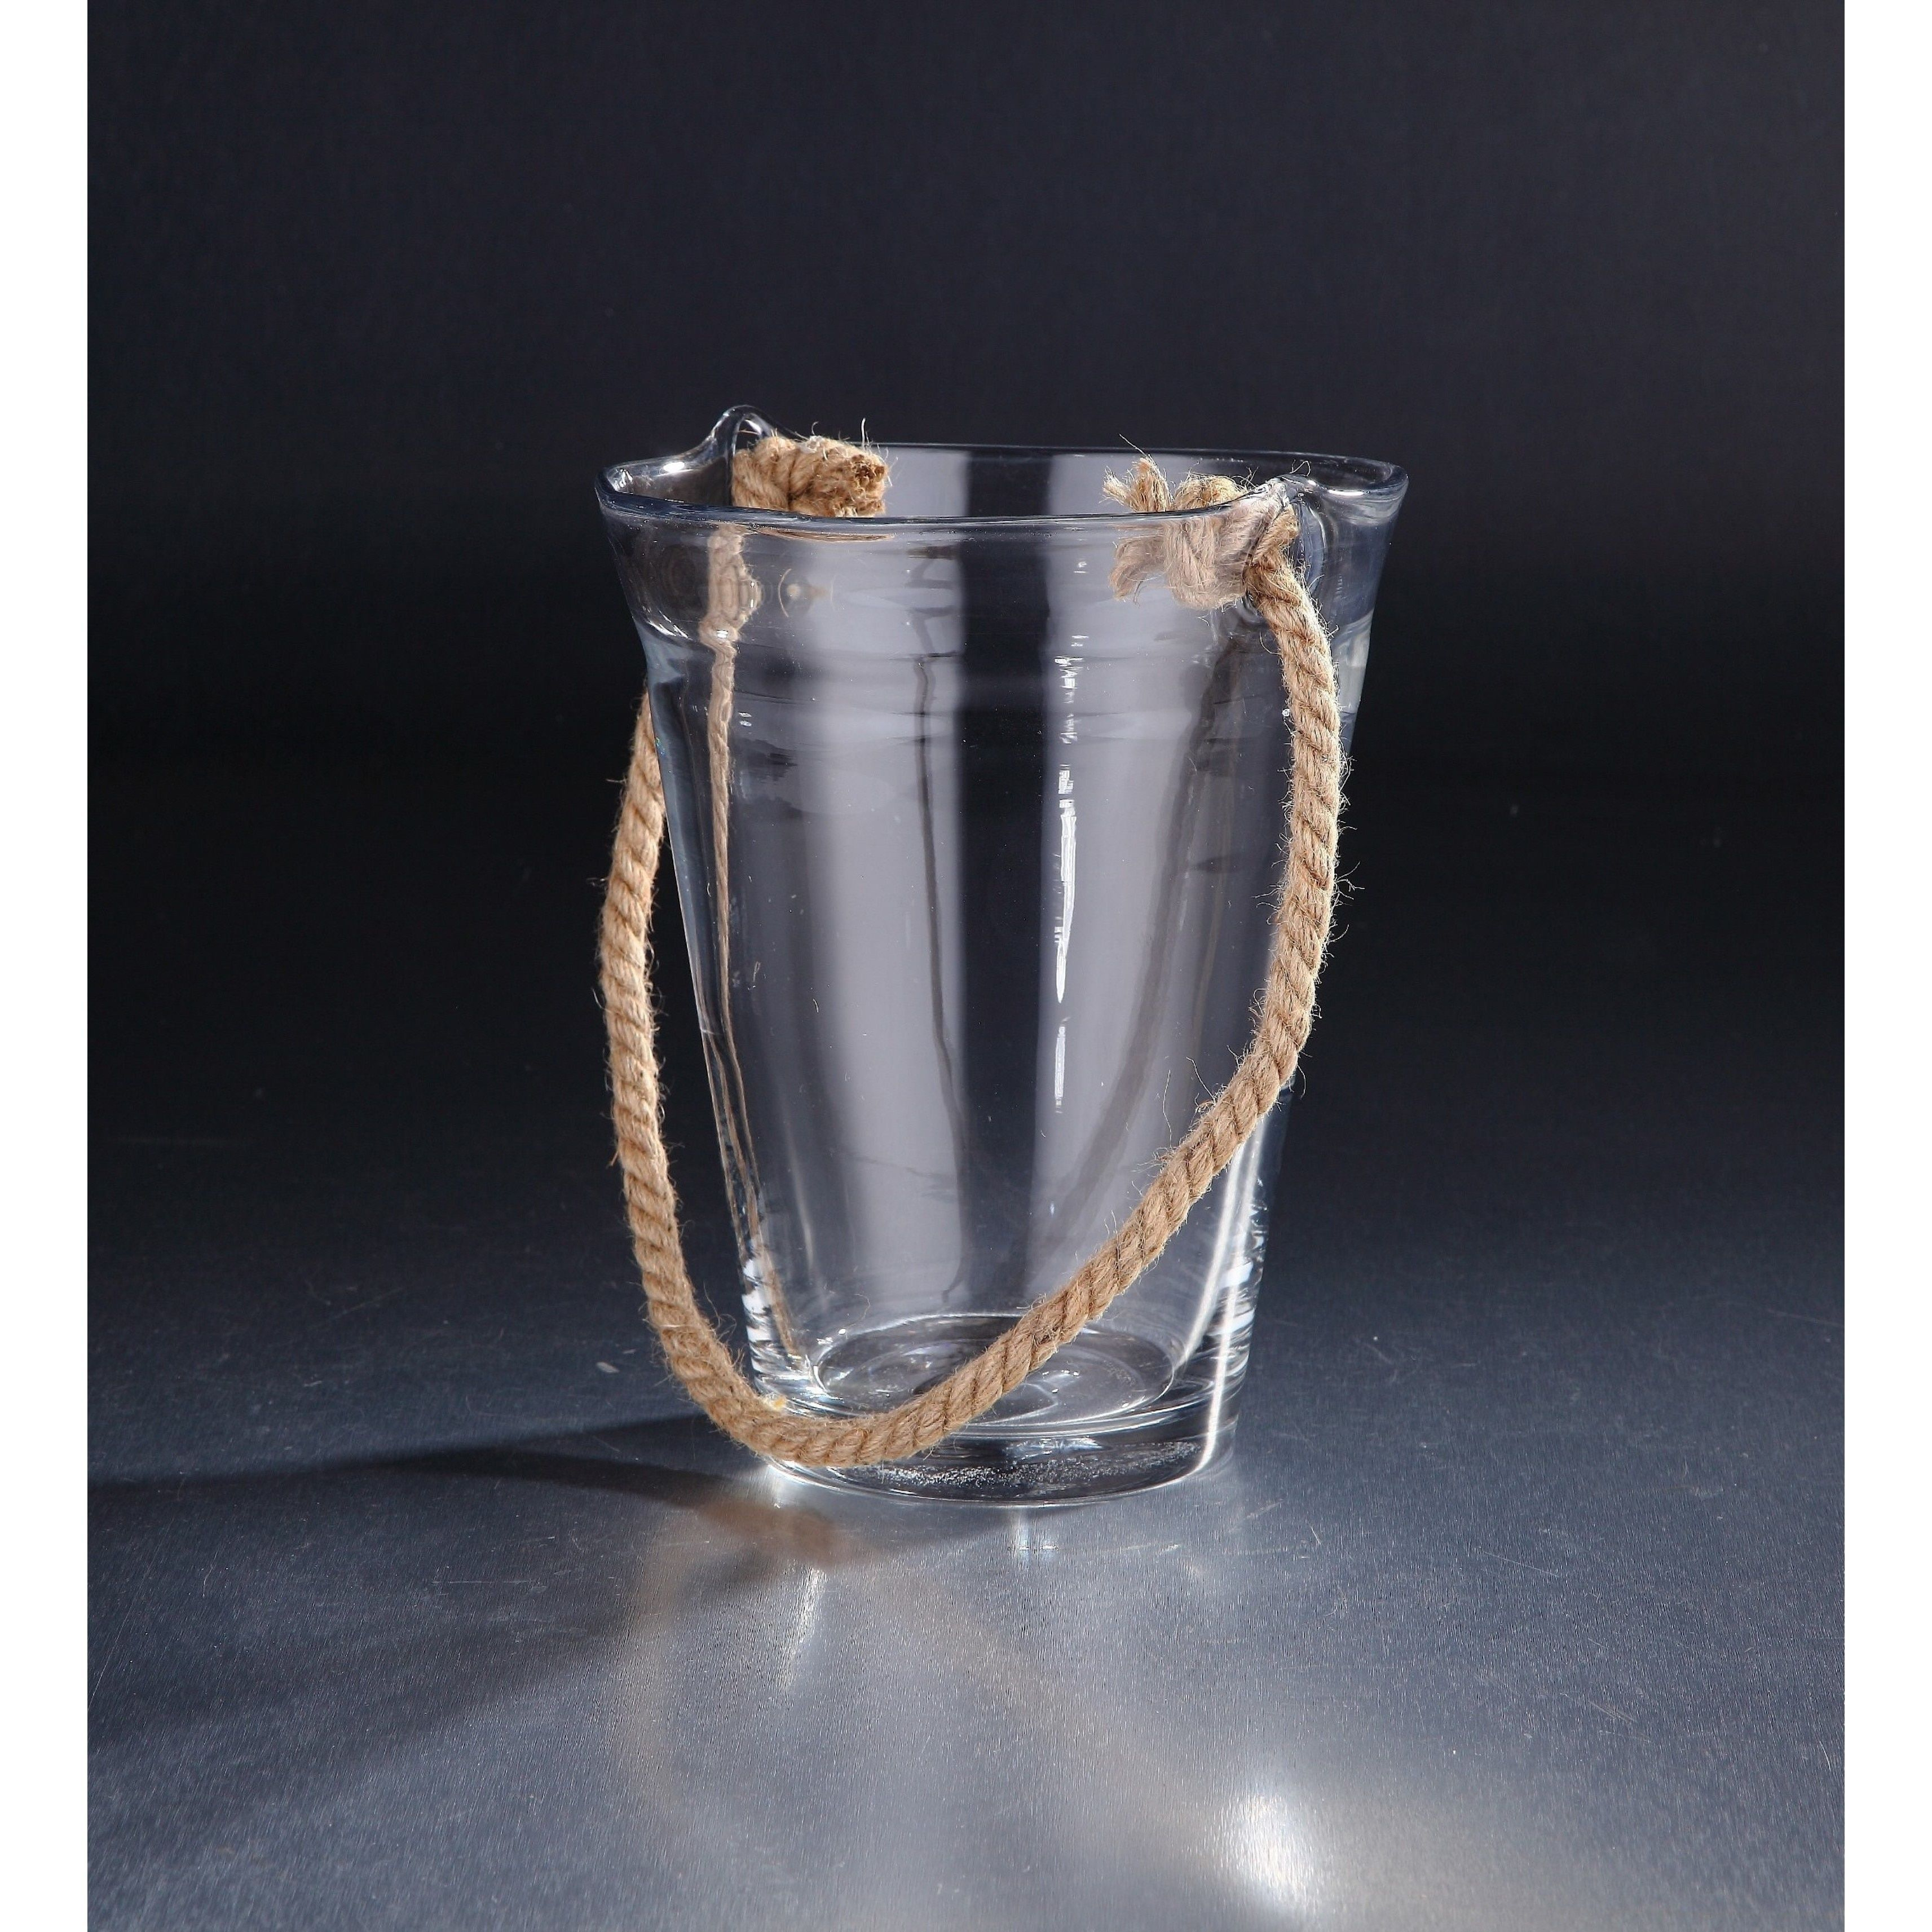 saveoncrafts vases trumpet recycled cylindervases cylinder fluted vase b sale hurricane glass off